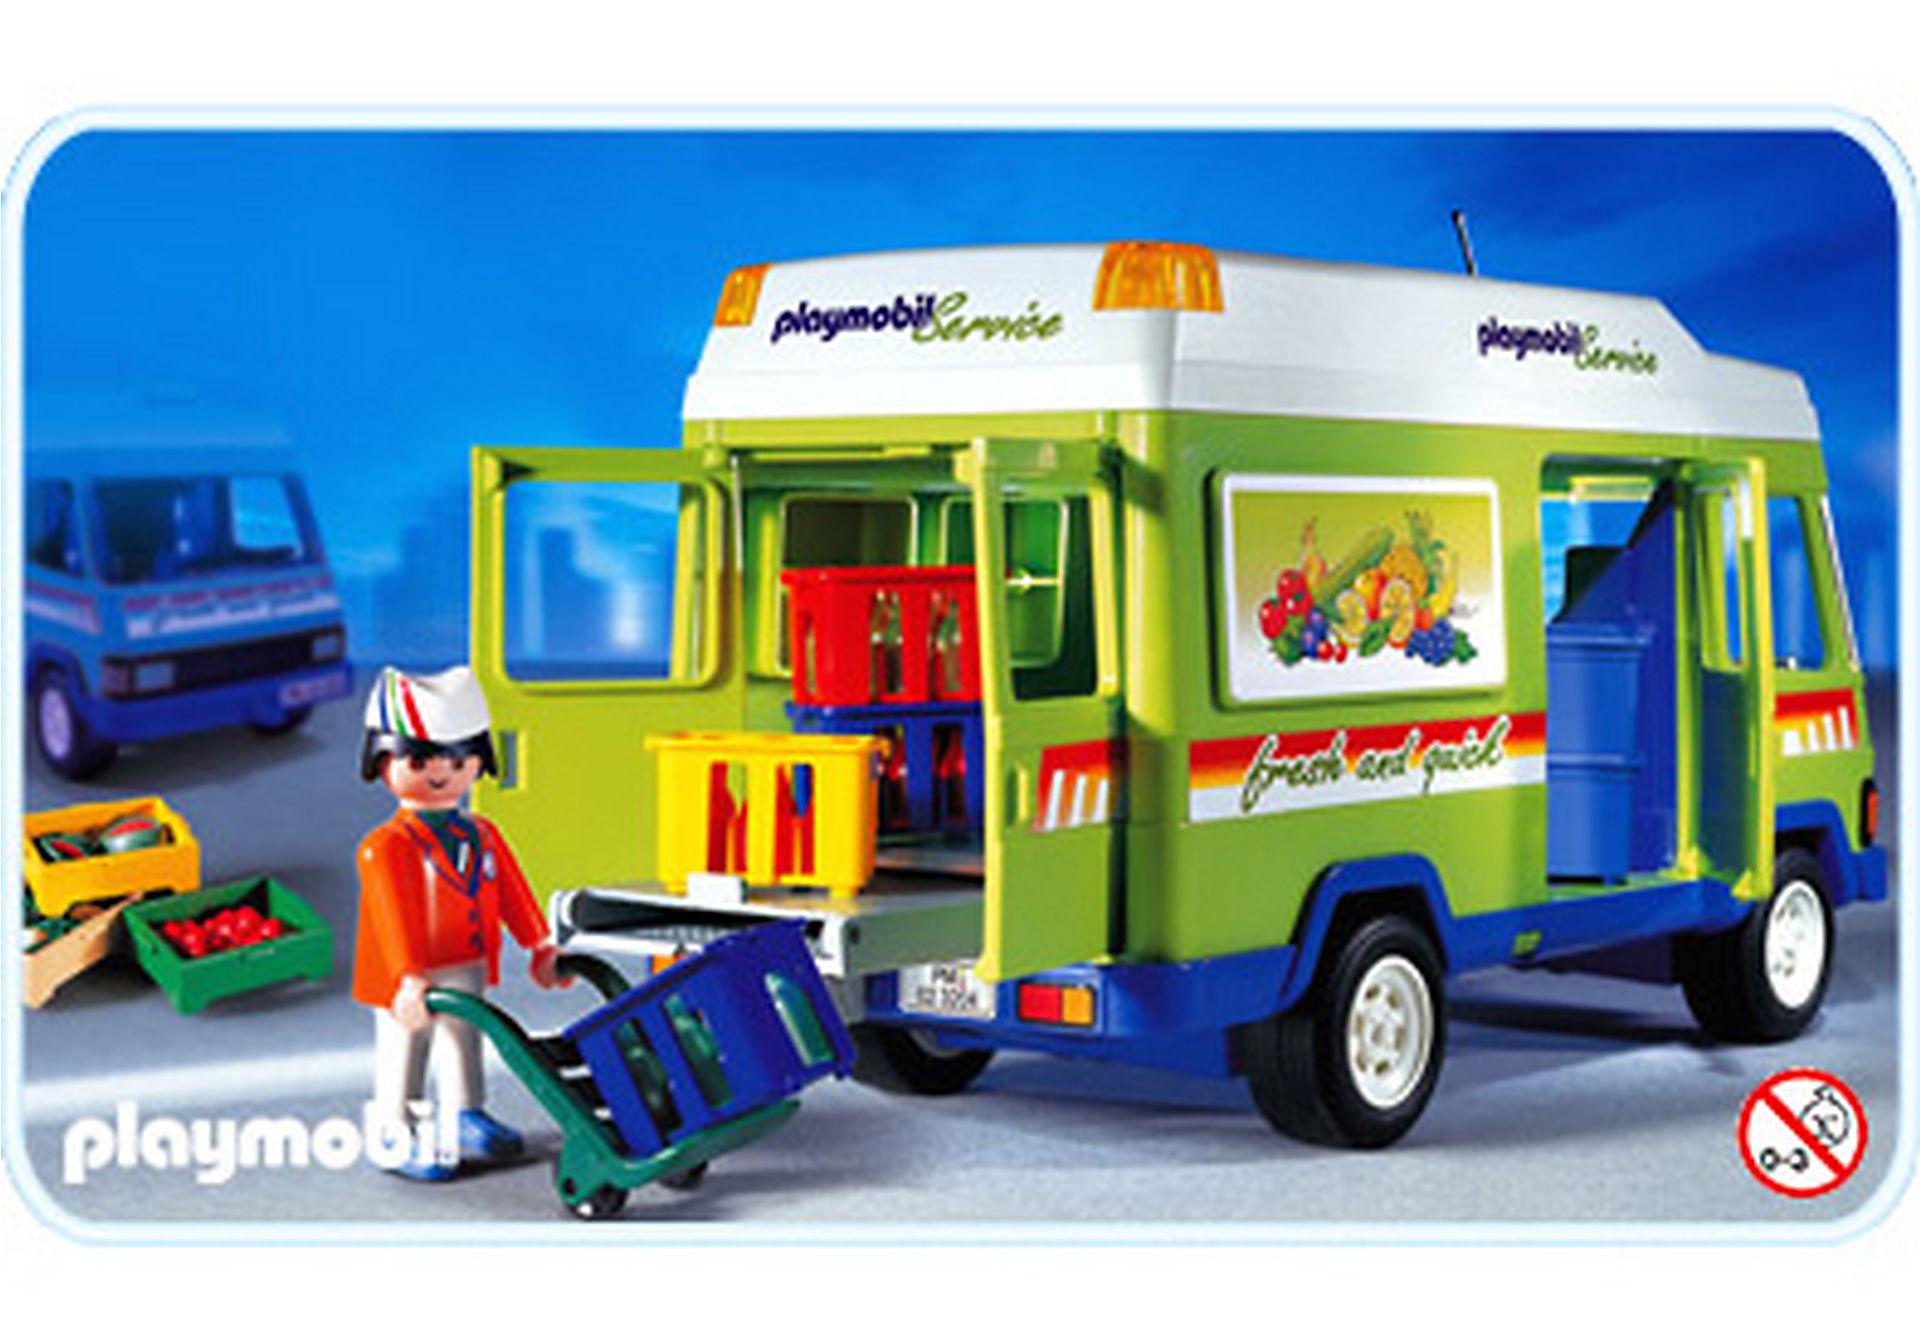 http://media.playmobil.com/i/playmobil/3204-C_product_detail/Lieferwagen